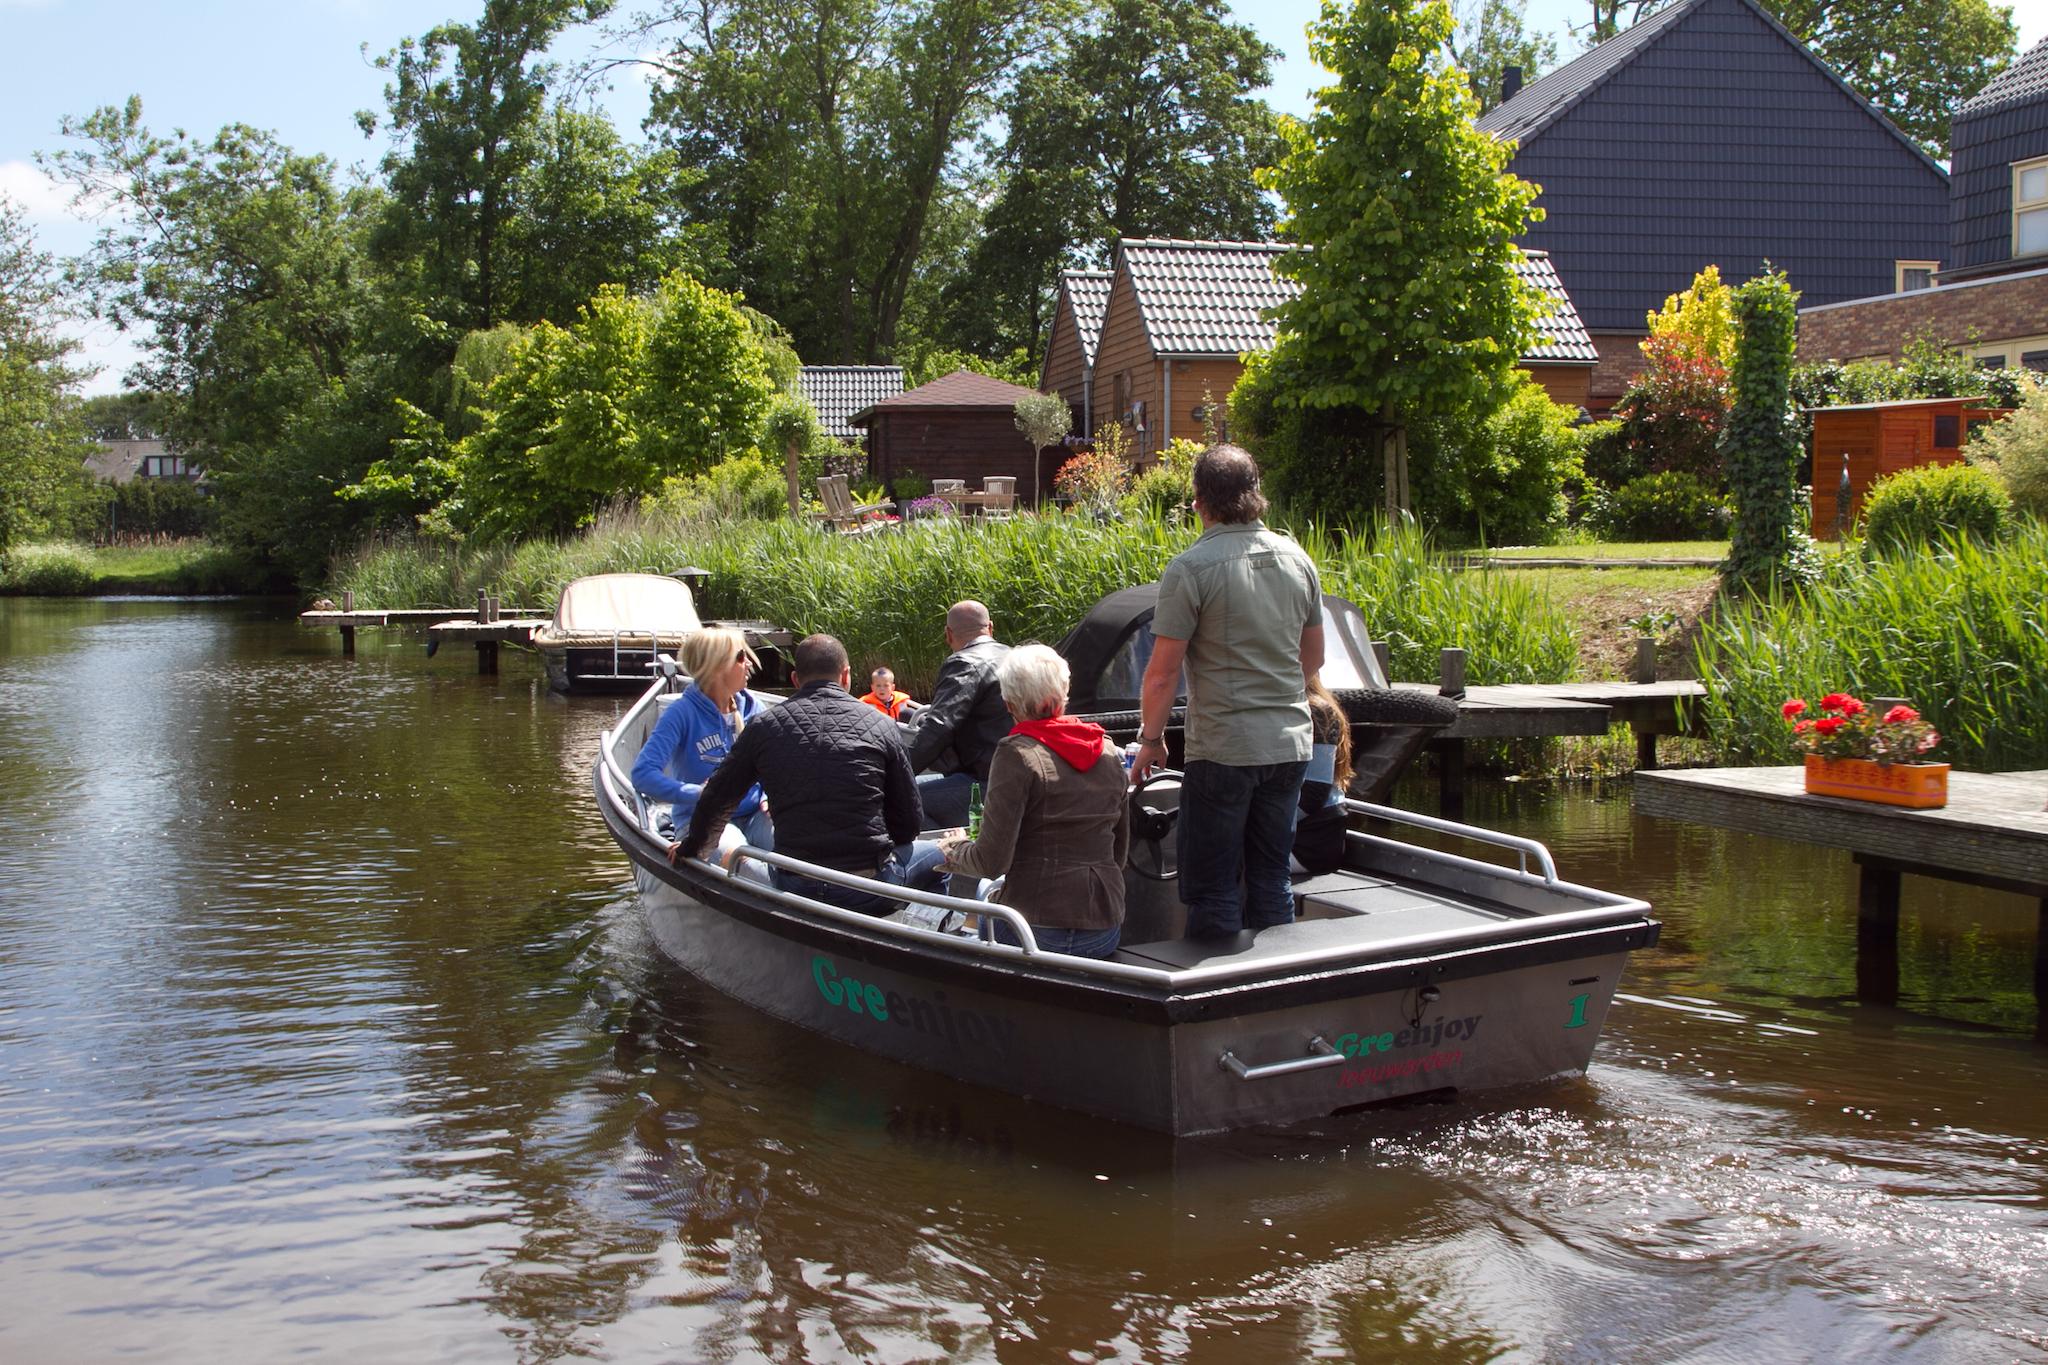 Enjoy the canals of Leeuwarden